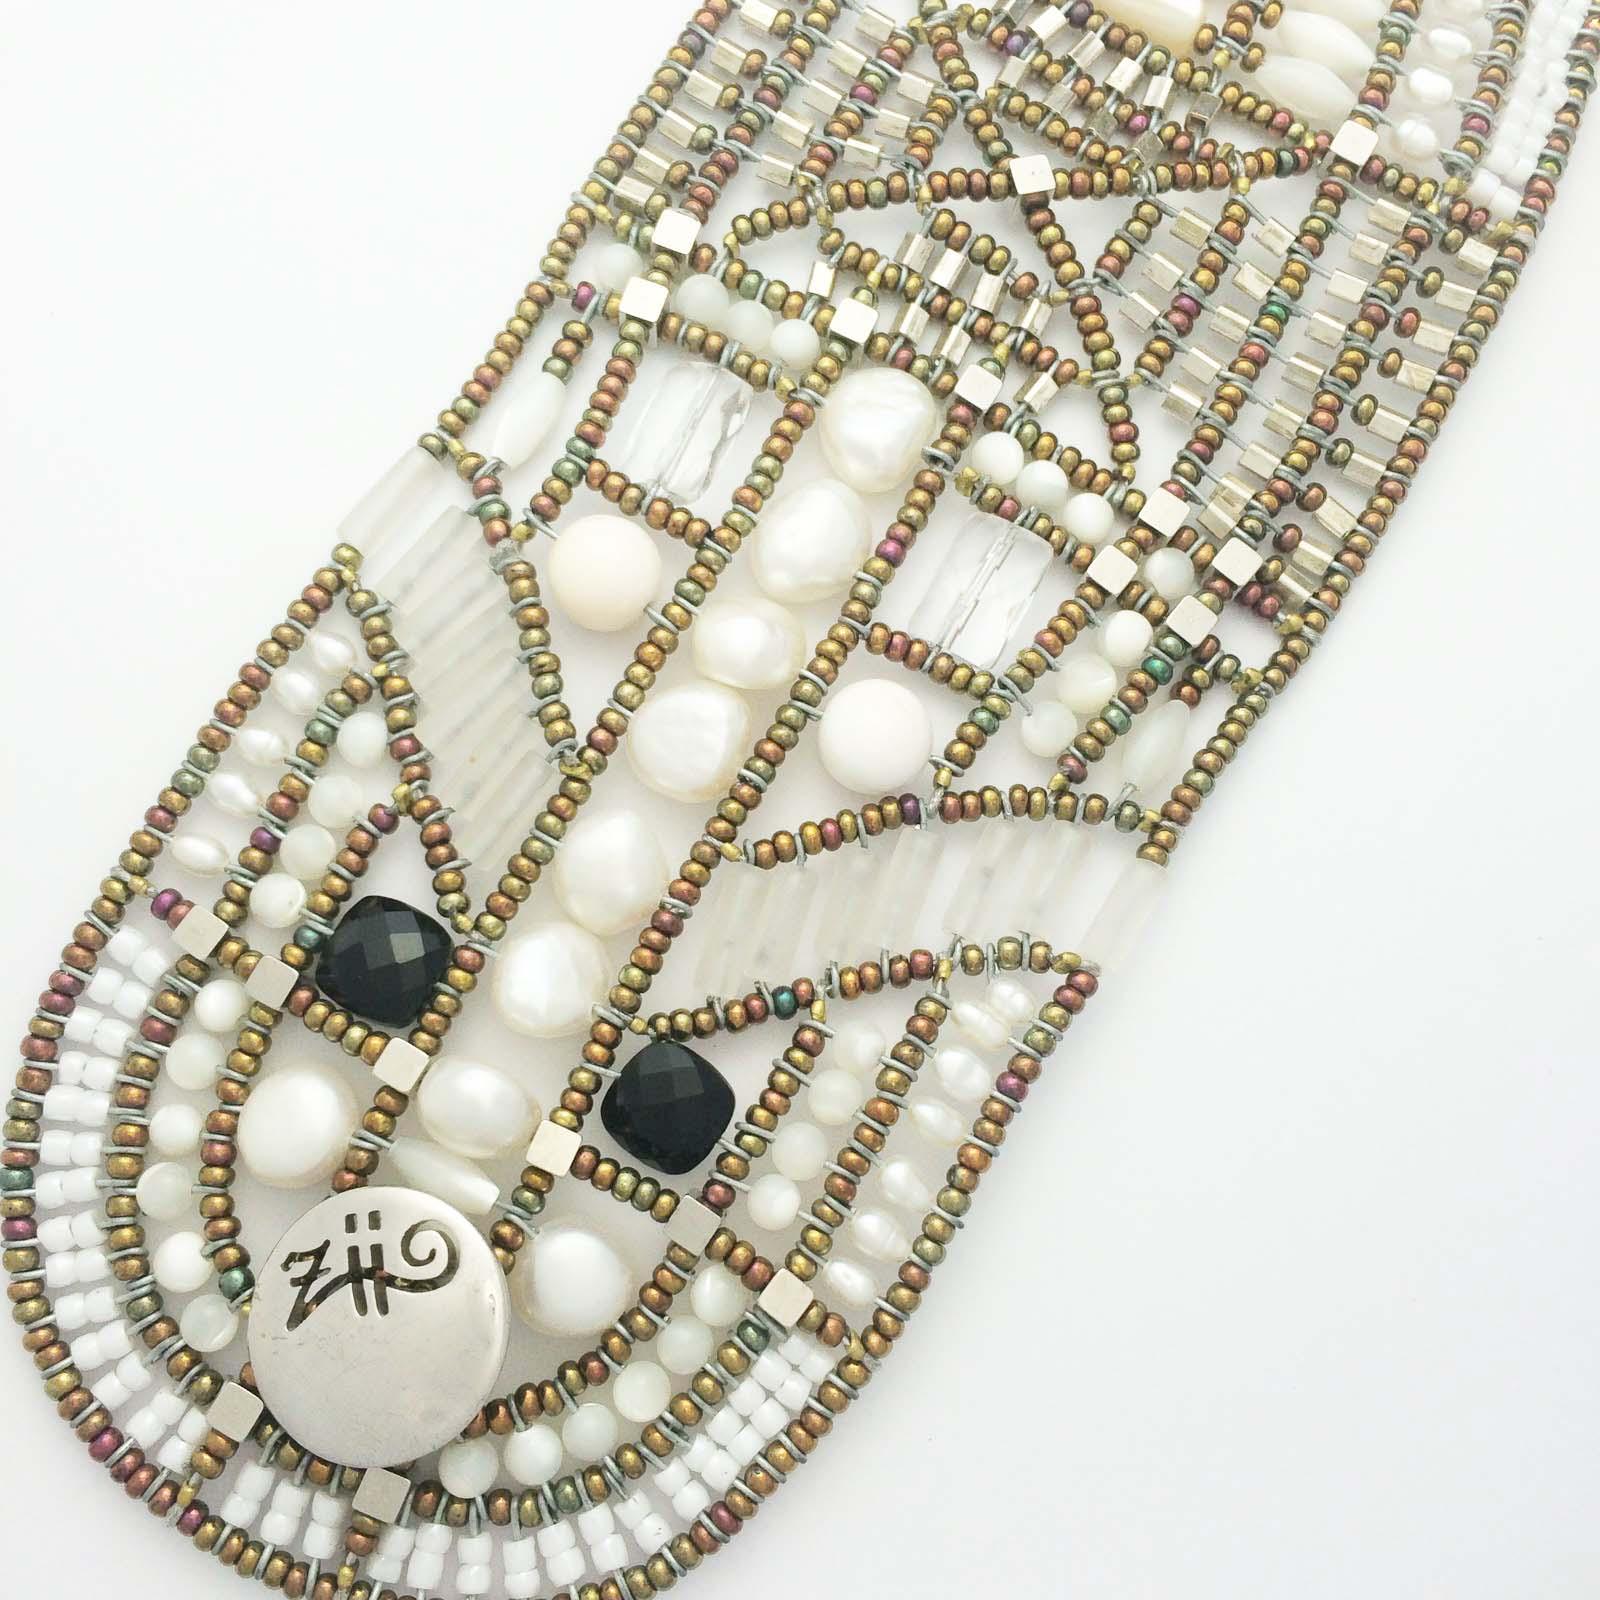 Handmade Italian cuff with pearls and semi precious stones